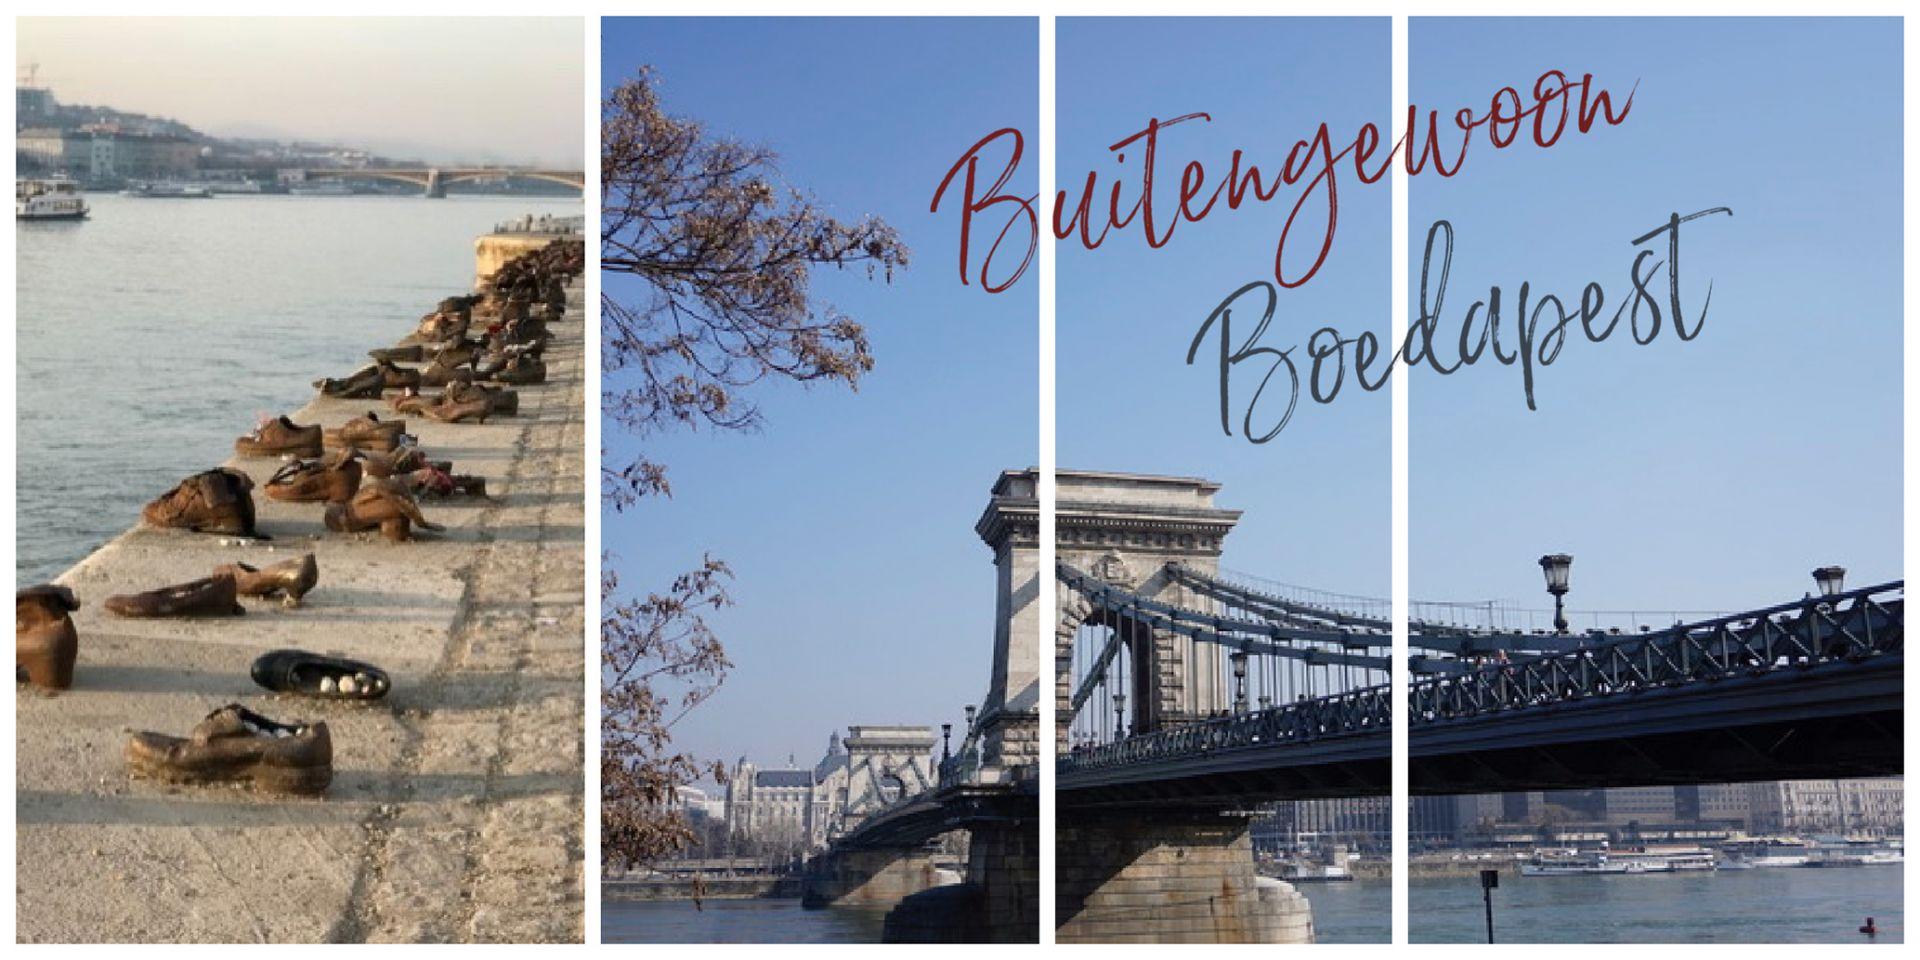 Buitengewoon Boedapest